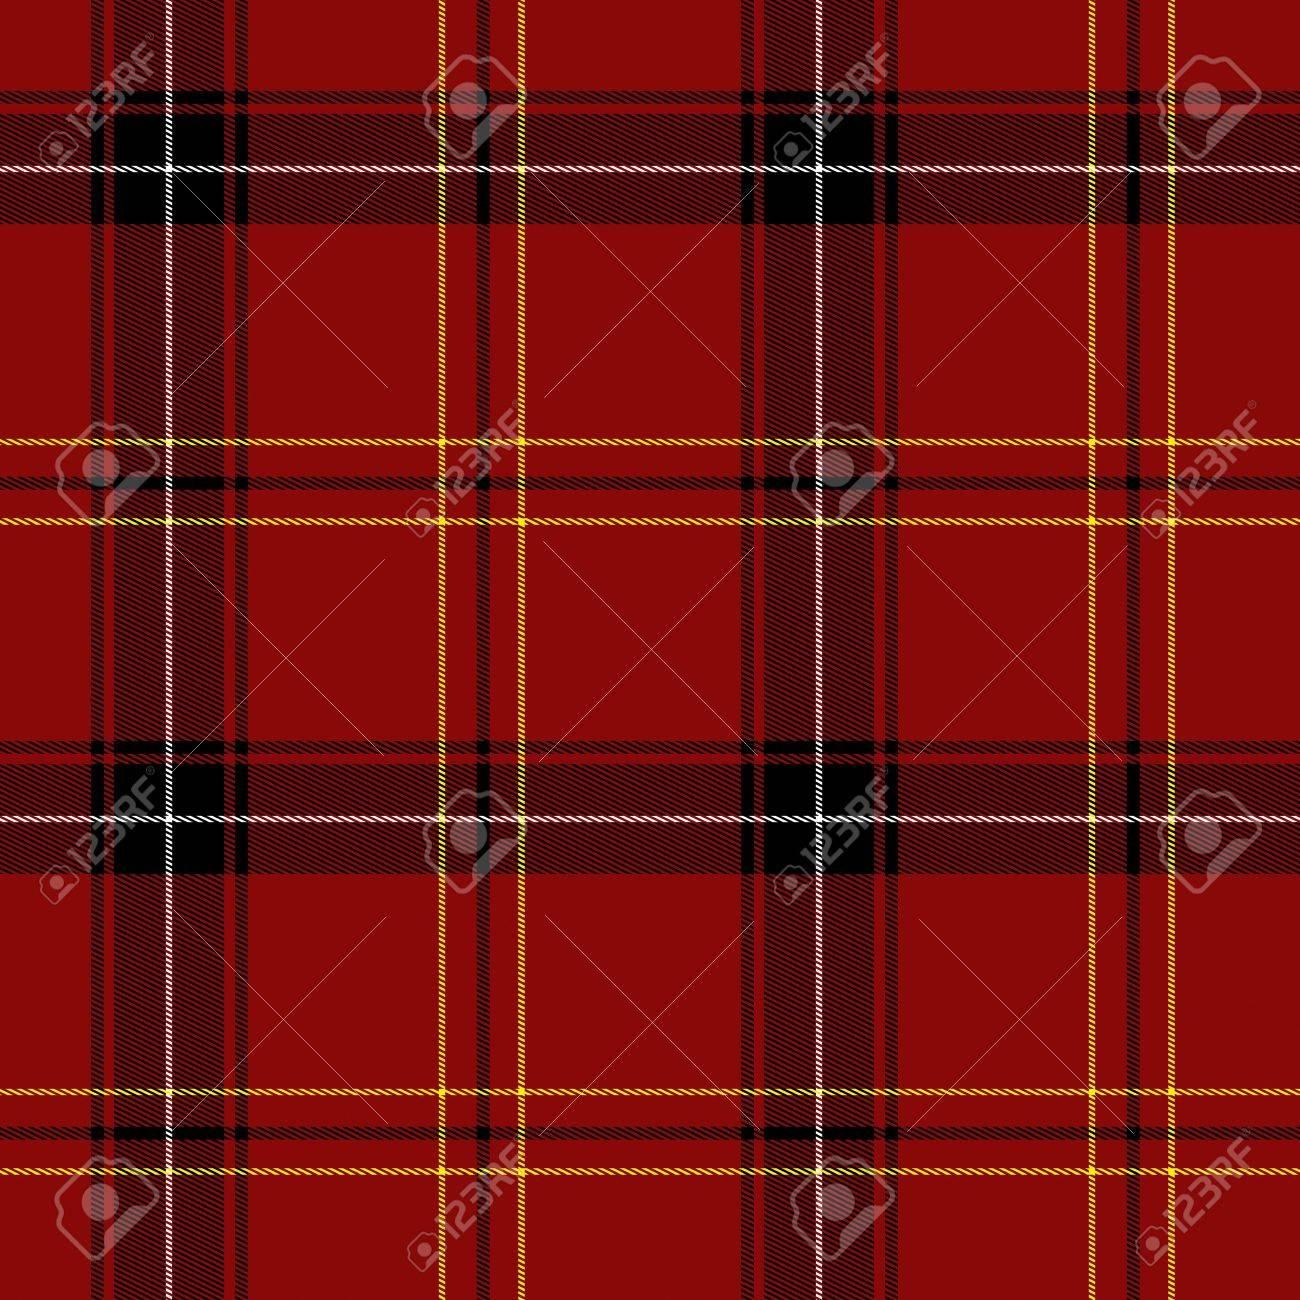 Red Tartan Seamless Pattern (red, black, white and yellow) - 5801207